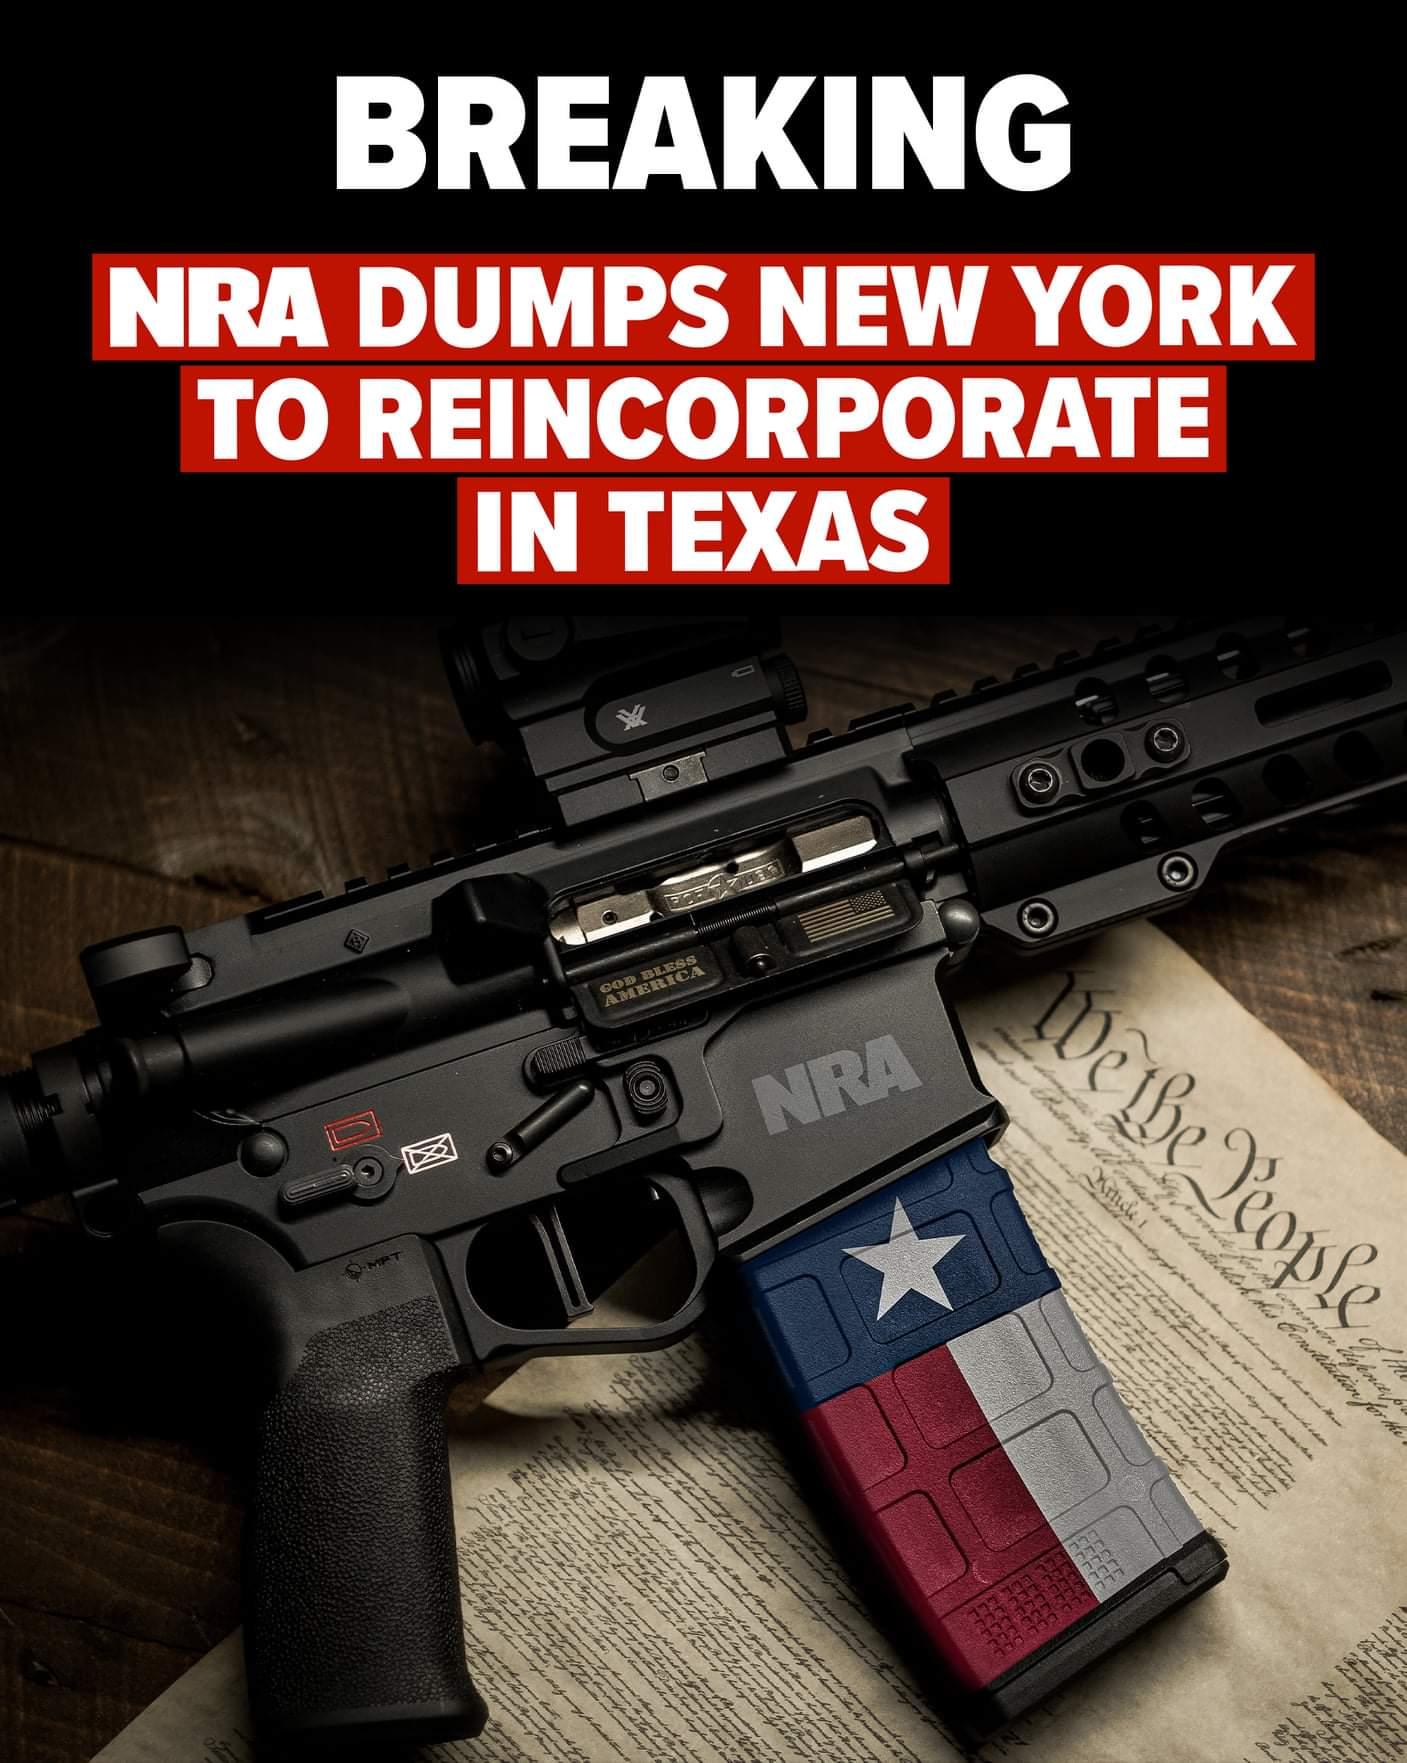 BREAKING NEWS: NRA Dumps New York to... - NRA Institute for Legislative Action   Facebook